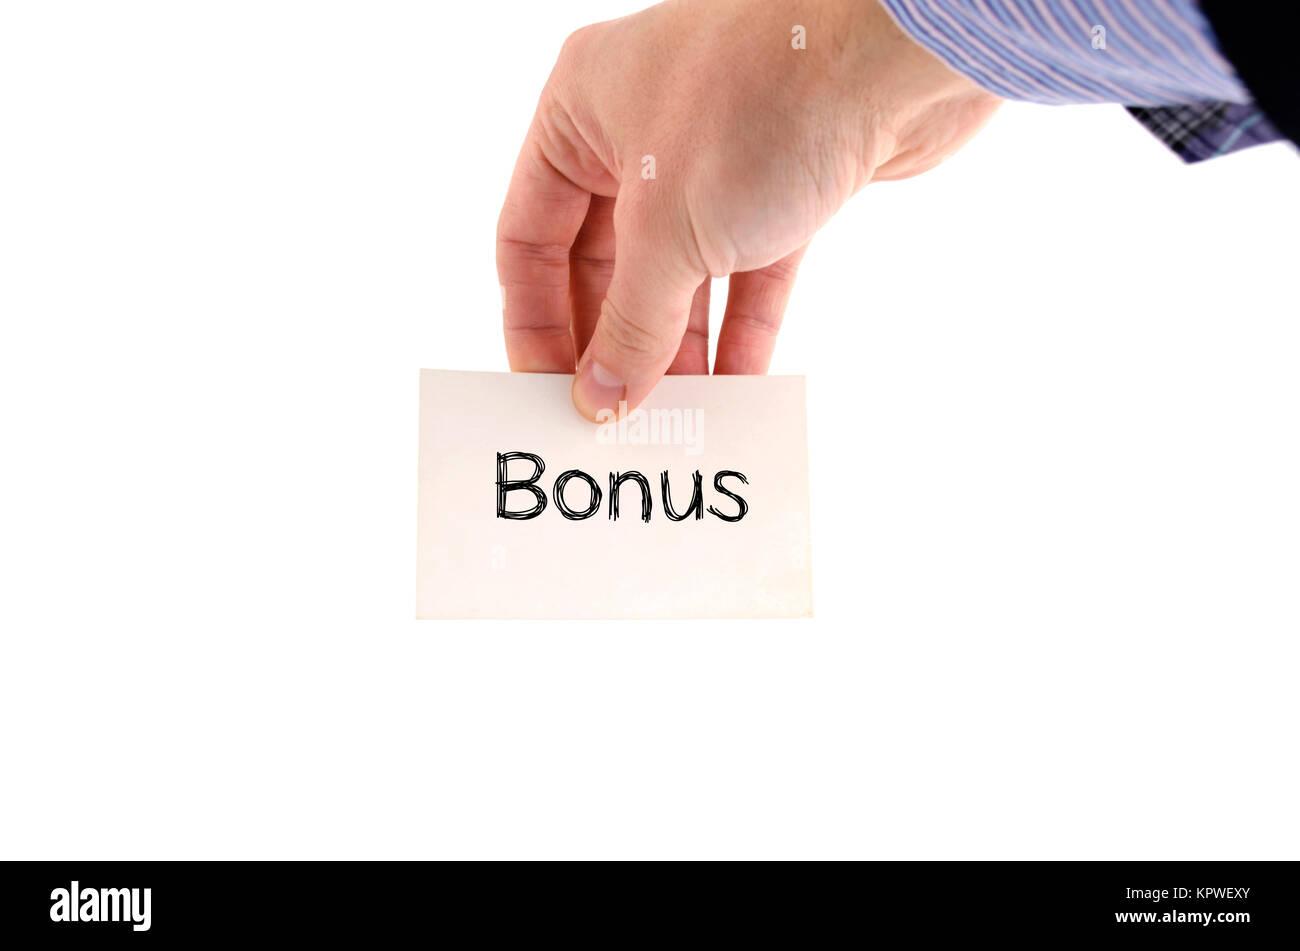 Bonus text concept - Stock Image